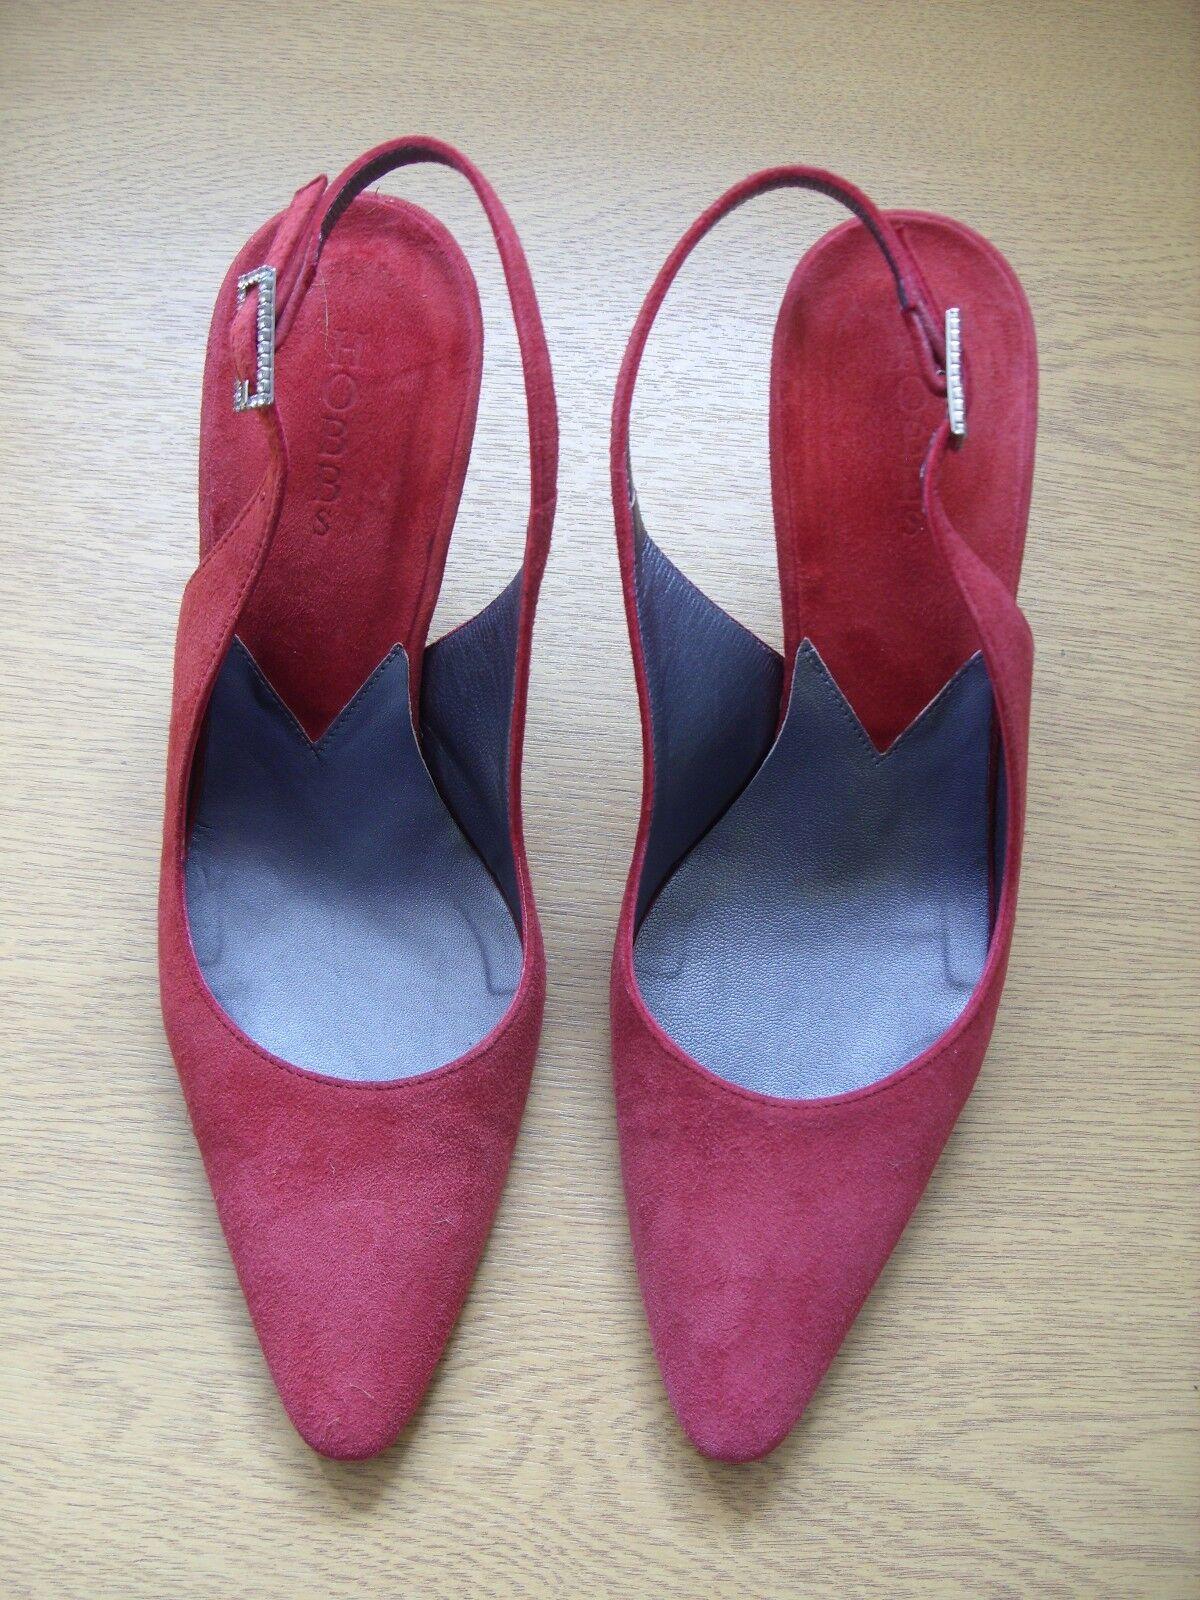 Chaussures Femmes Hobbs Crimson Cuir Daim Sling-Dos, UK 3.5 EU 36, Italien 3290